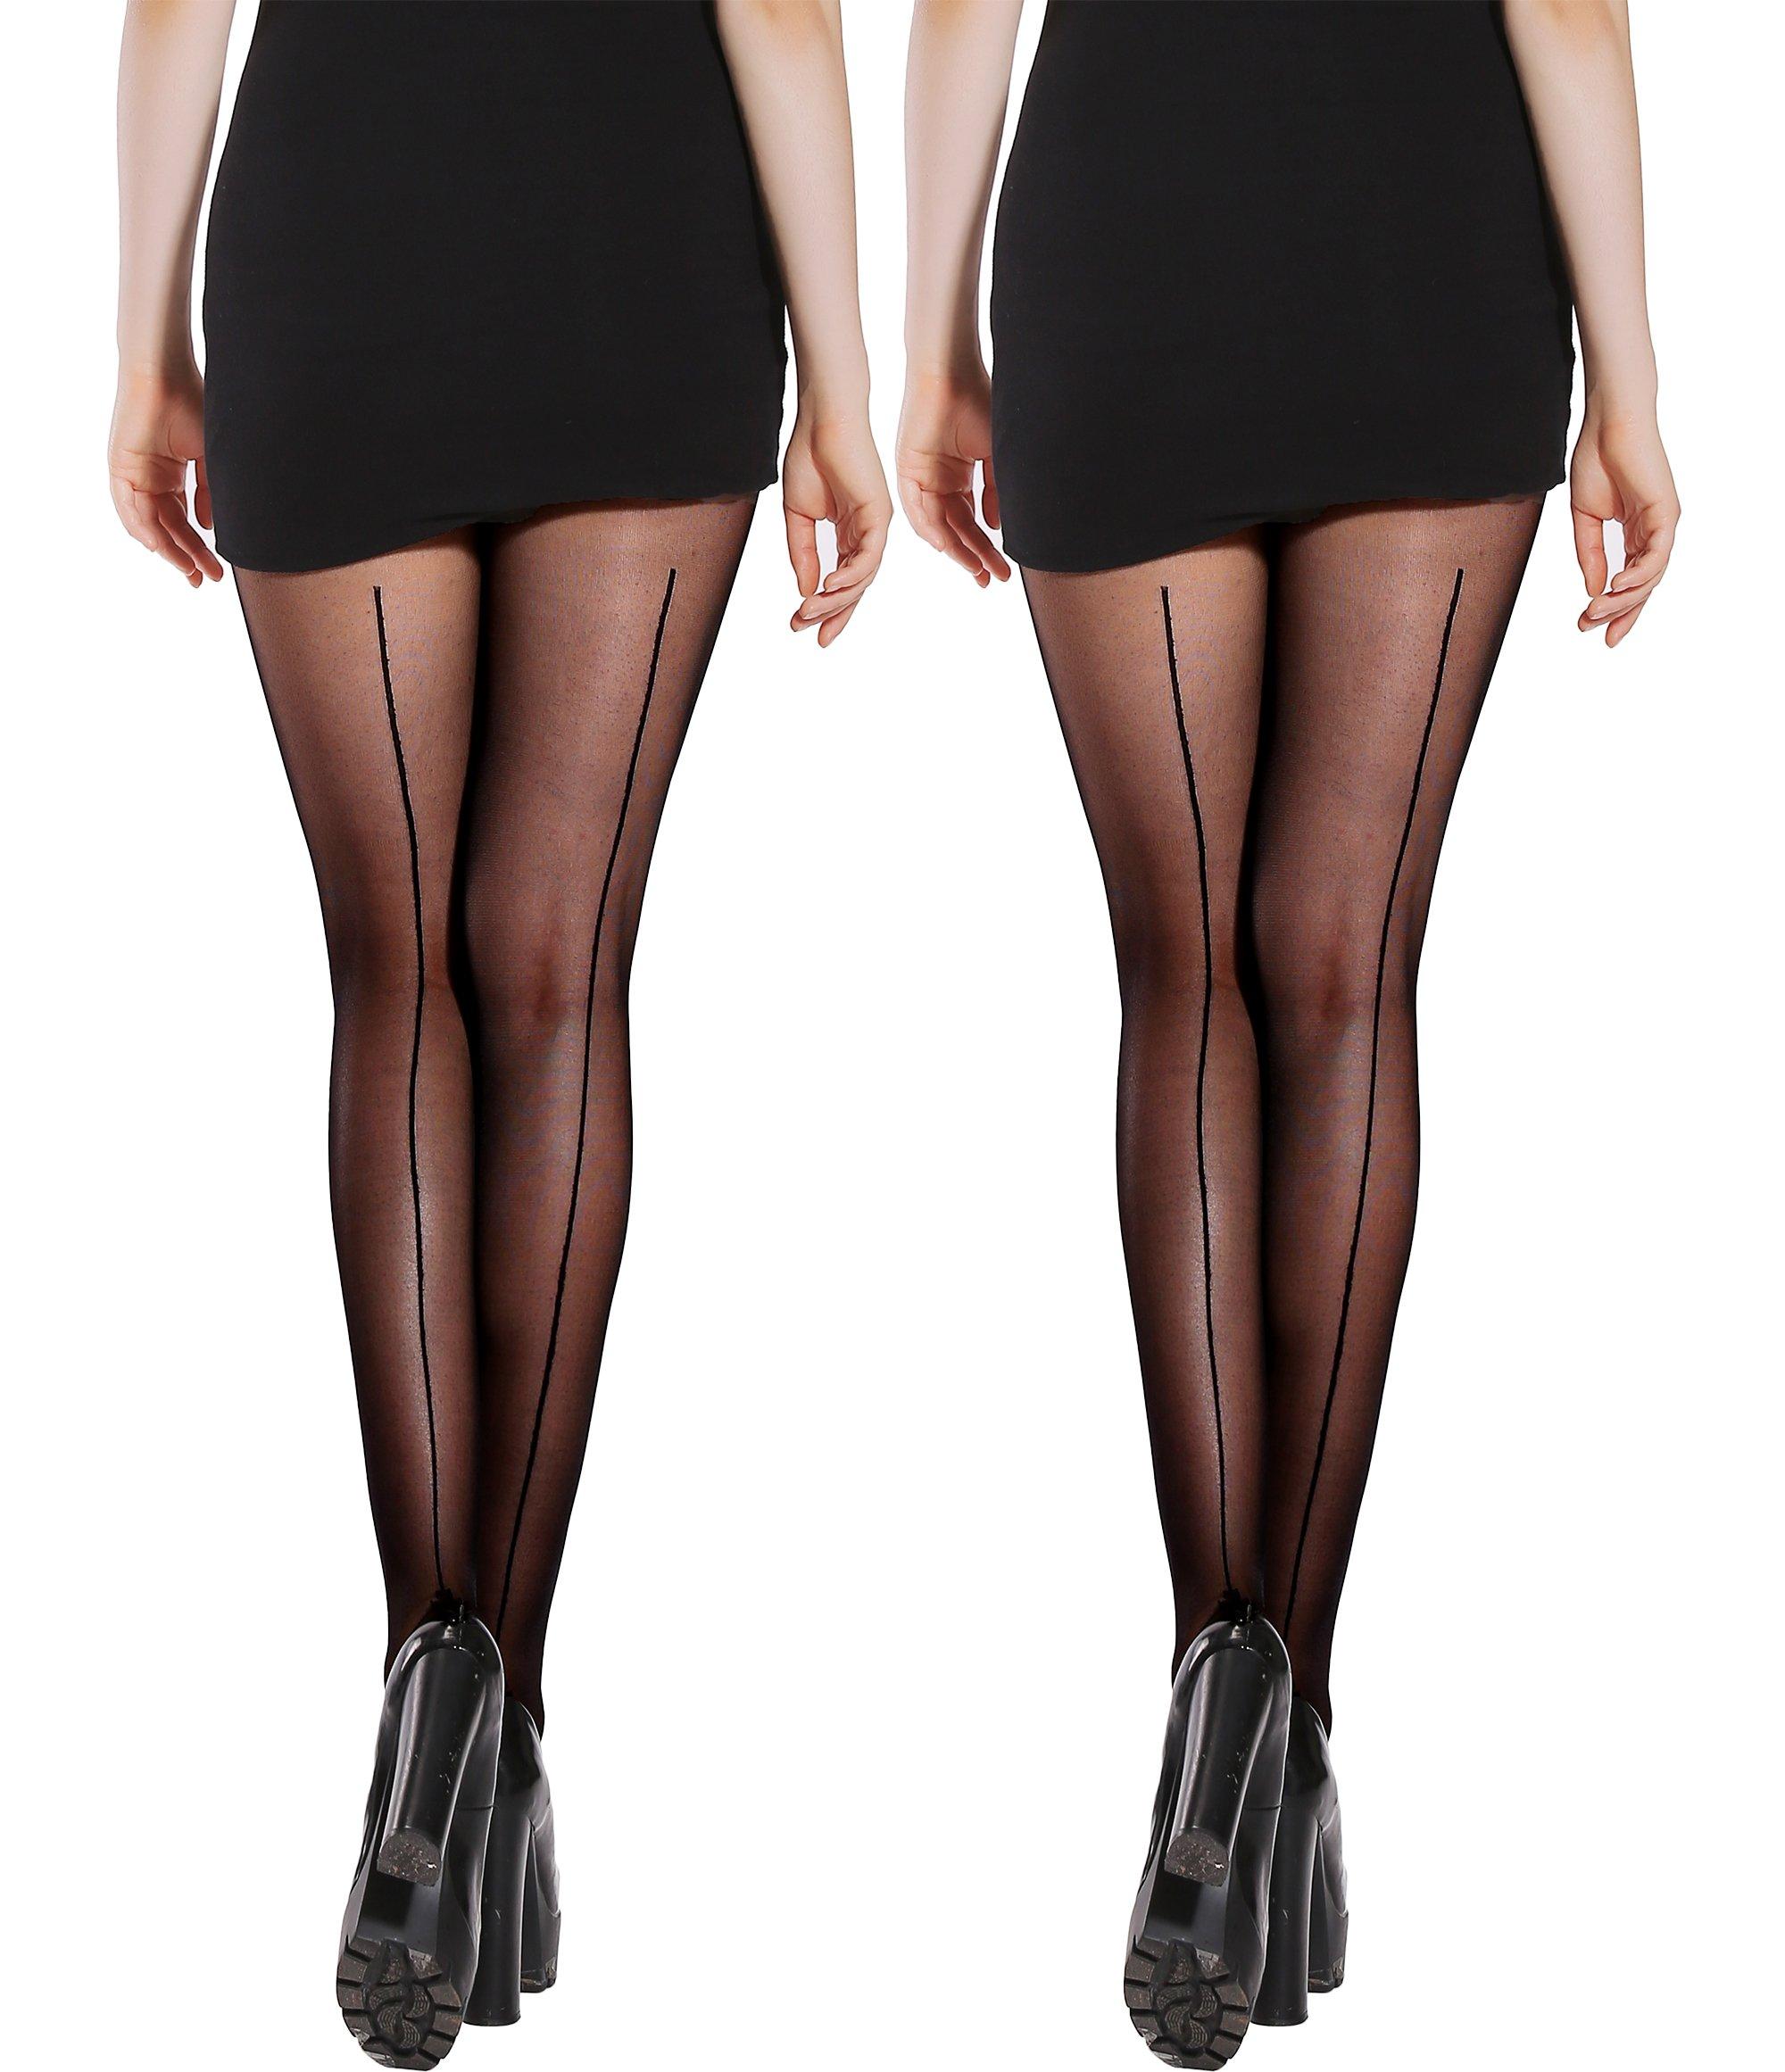 Semi Sheer Pantyhose Back Seam &Bikini Crotch Tights Shaping Leg Stockings 2 Pack (Black×2, C/D)